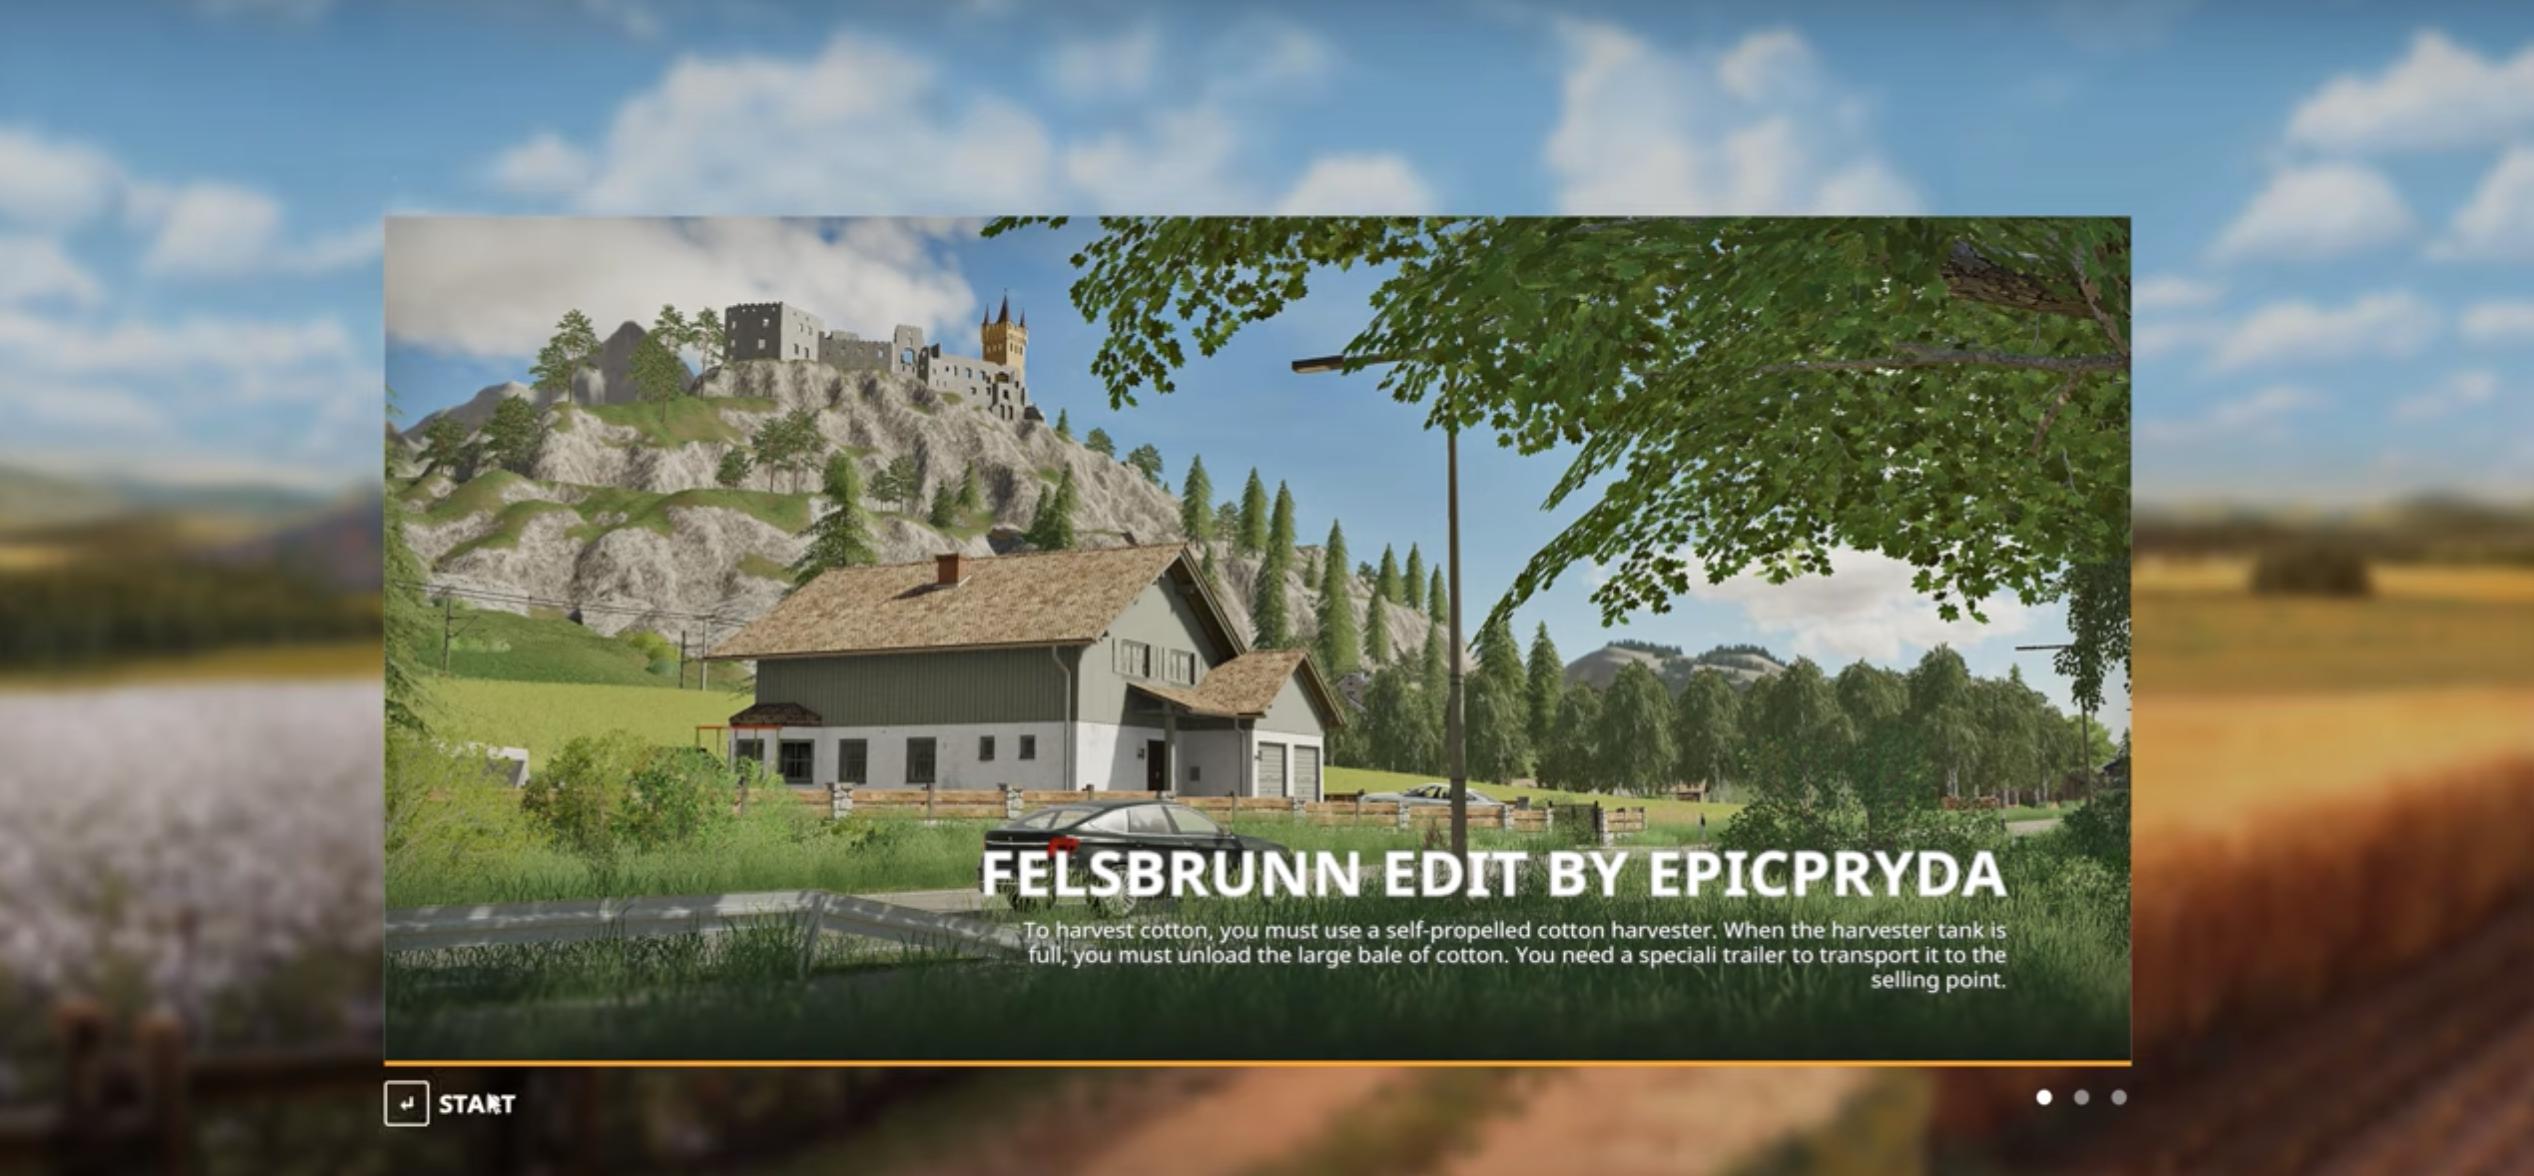 FS19 Felsbrunn Map Edit - Farming Simulator 19 mod, LS19 Mod